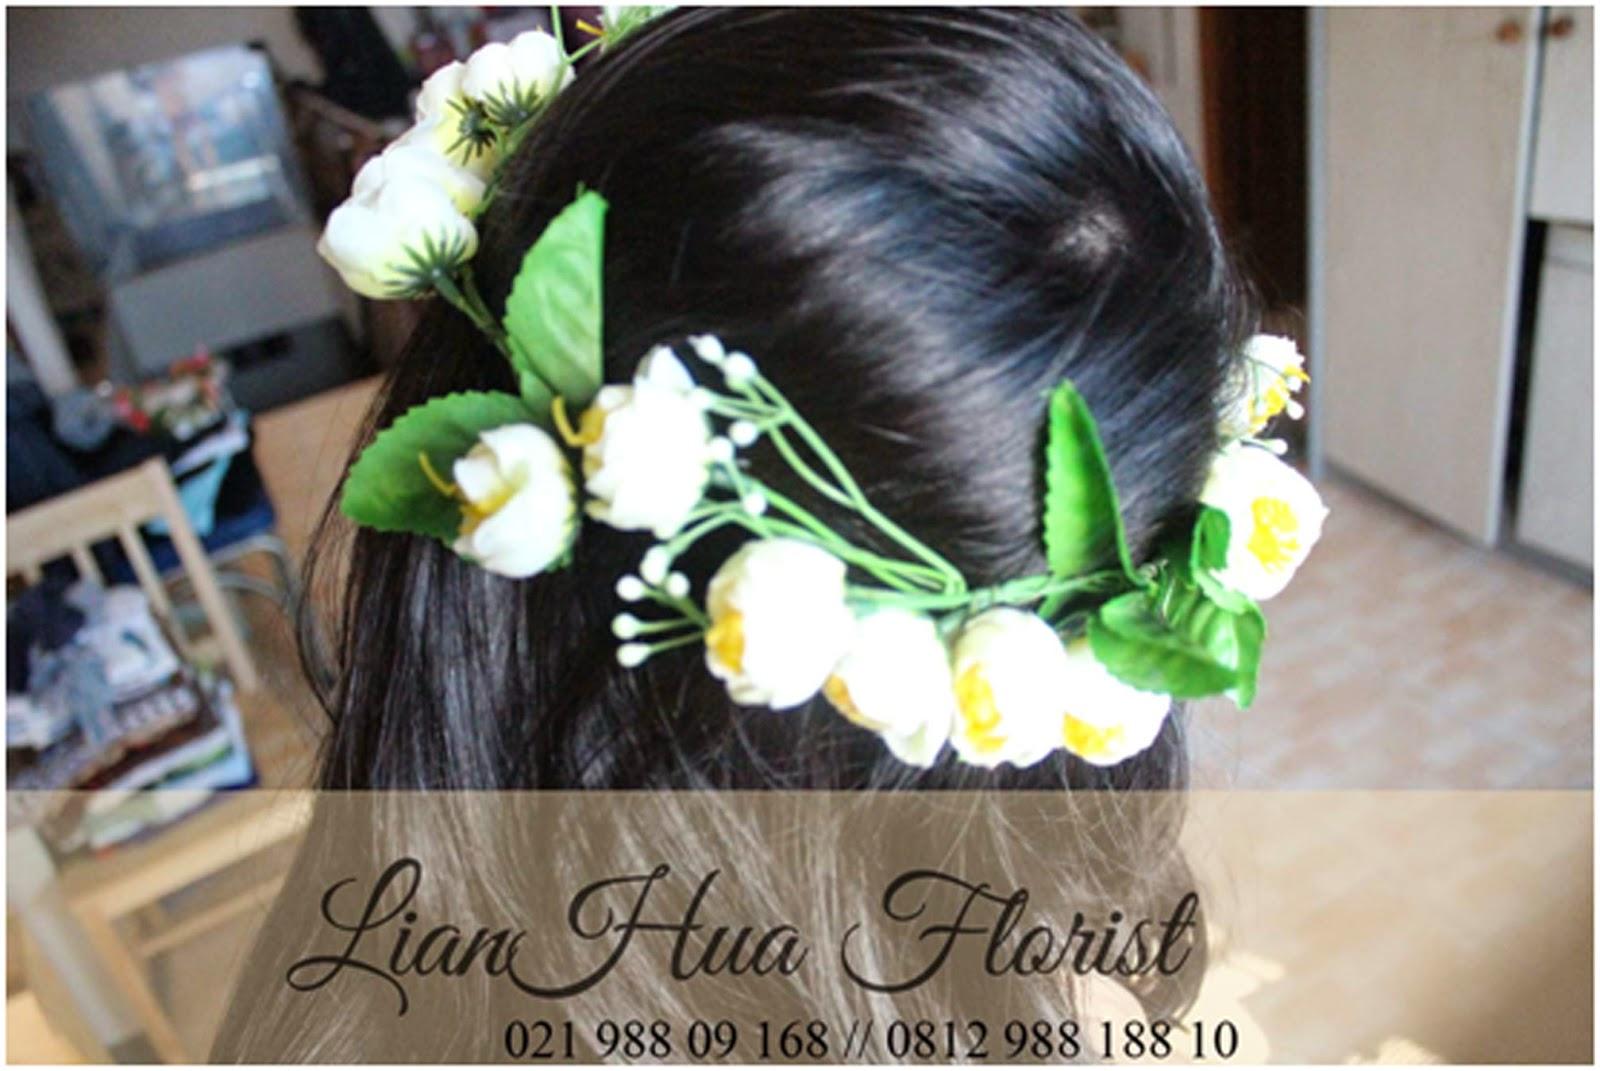 toko bunga, karangan bunga ucapan selamat, bunga pernikahan, headband bunga, bando bunga,